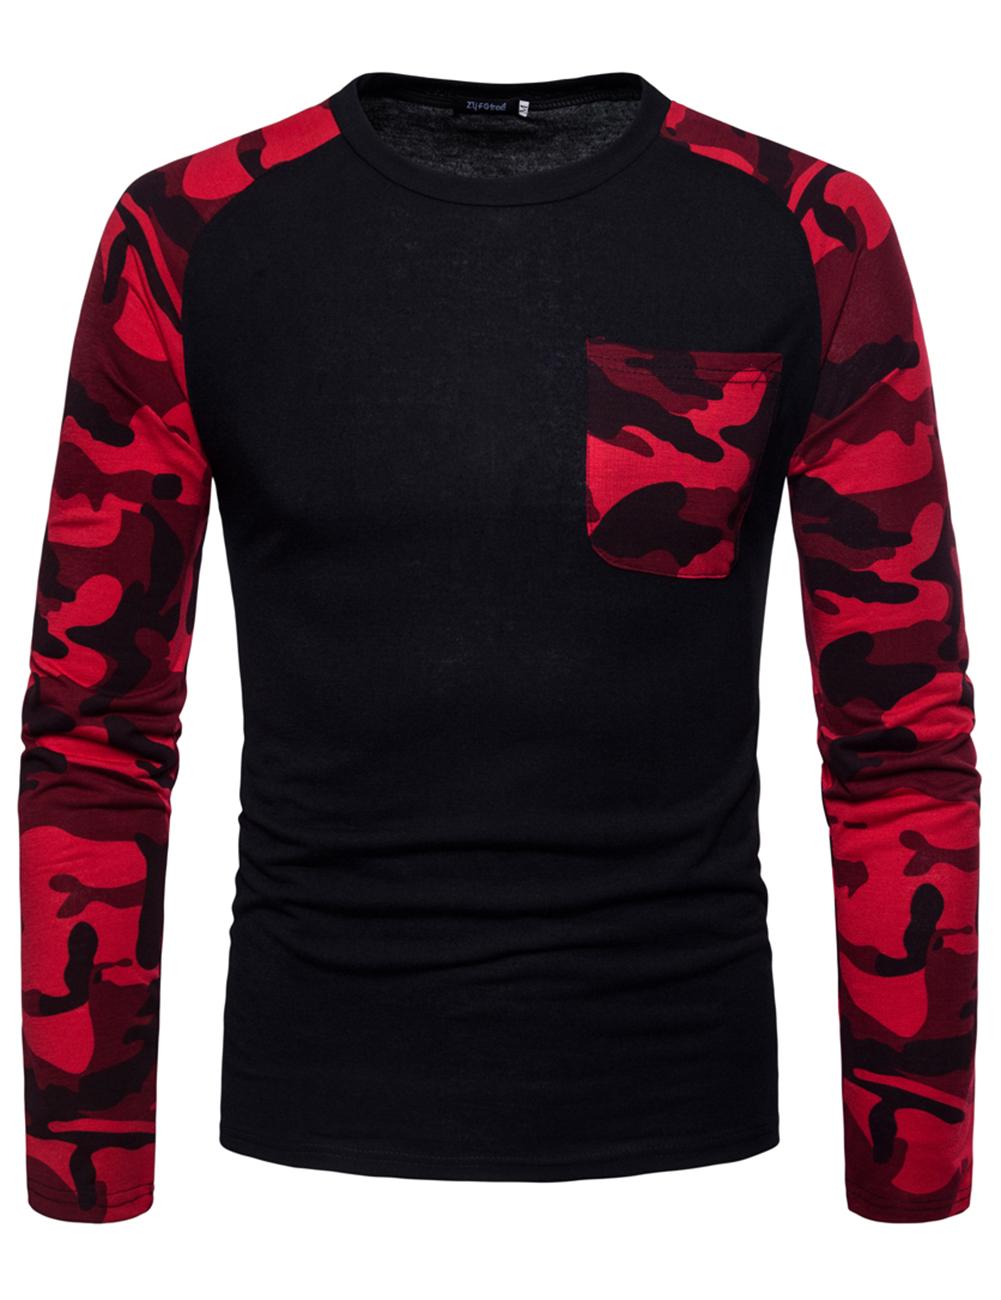 Man Stylish Long-Sleeve Sweater Camouflage Round Collar T-Shirt Tops Coat black_2XL